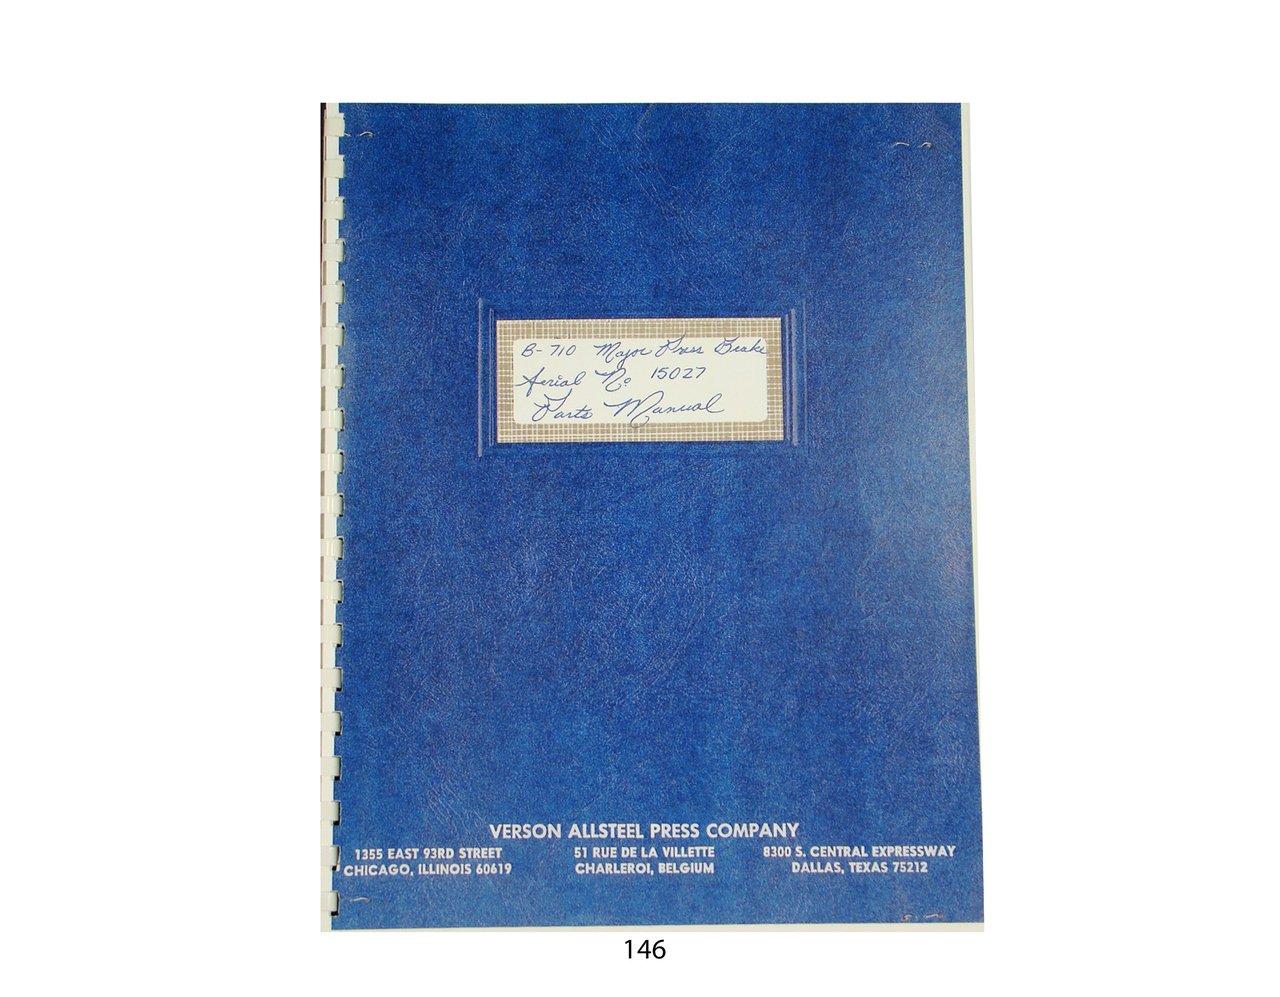 Verson Allsteel Press Brake Parts & Operation Manual: Verson Allsteel: Amazon.com: Books